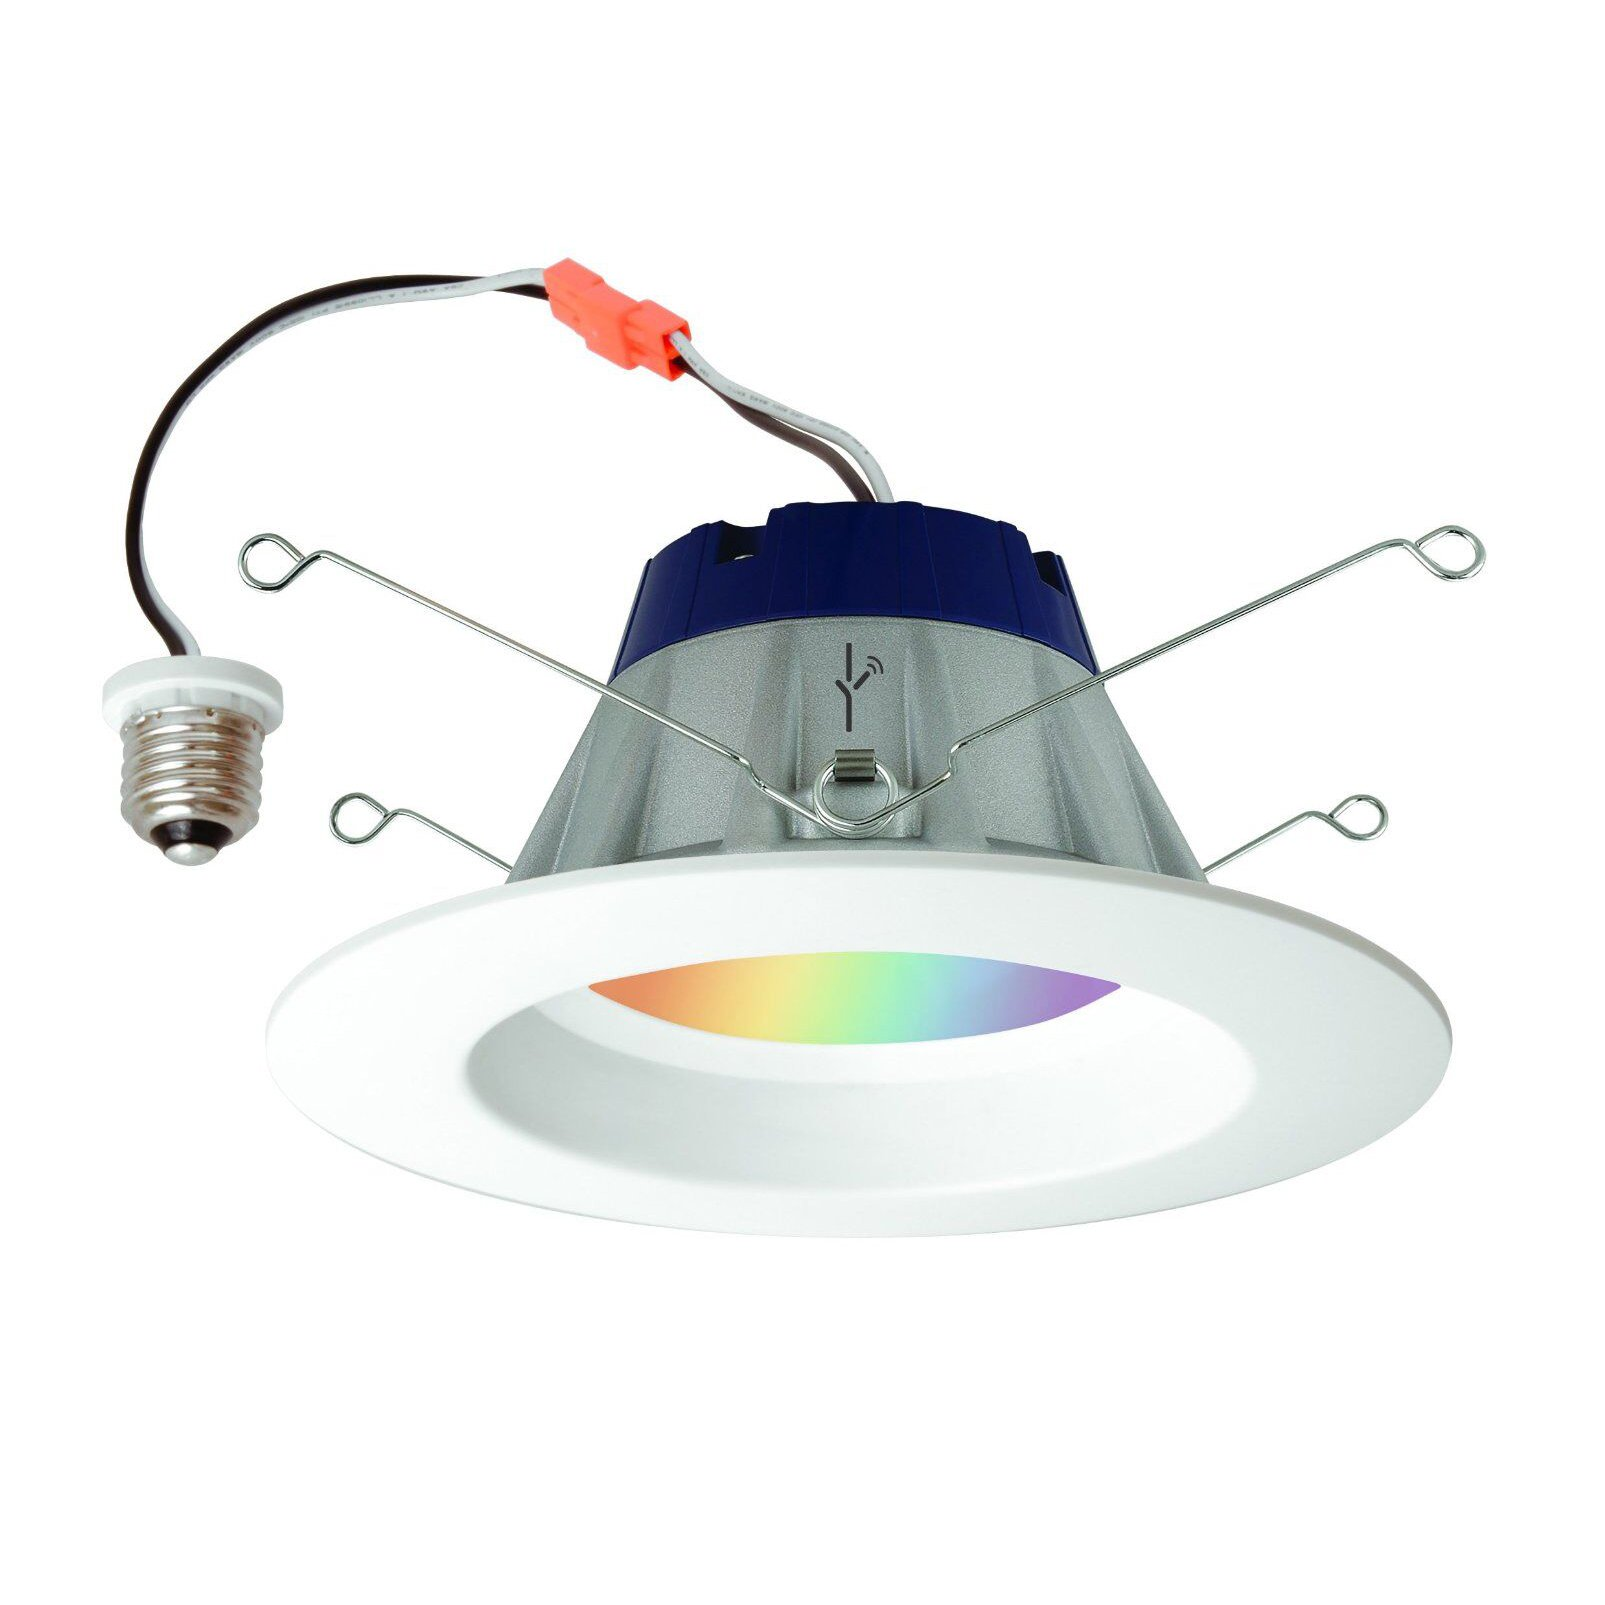 Sylvania Lightify 65W LED Smart Home 2700-6500K Color/White Light Bulb (10 Pack) - image 5 de 7